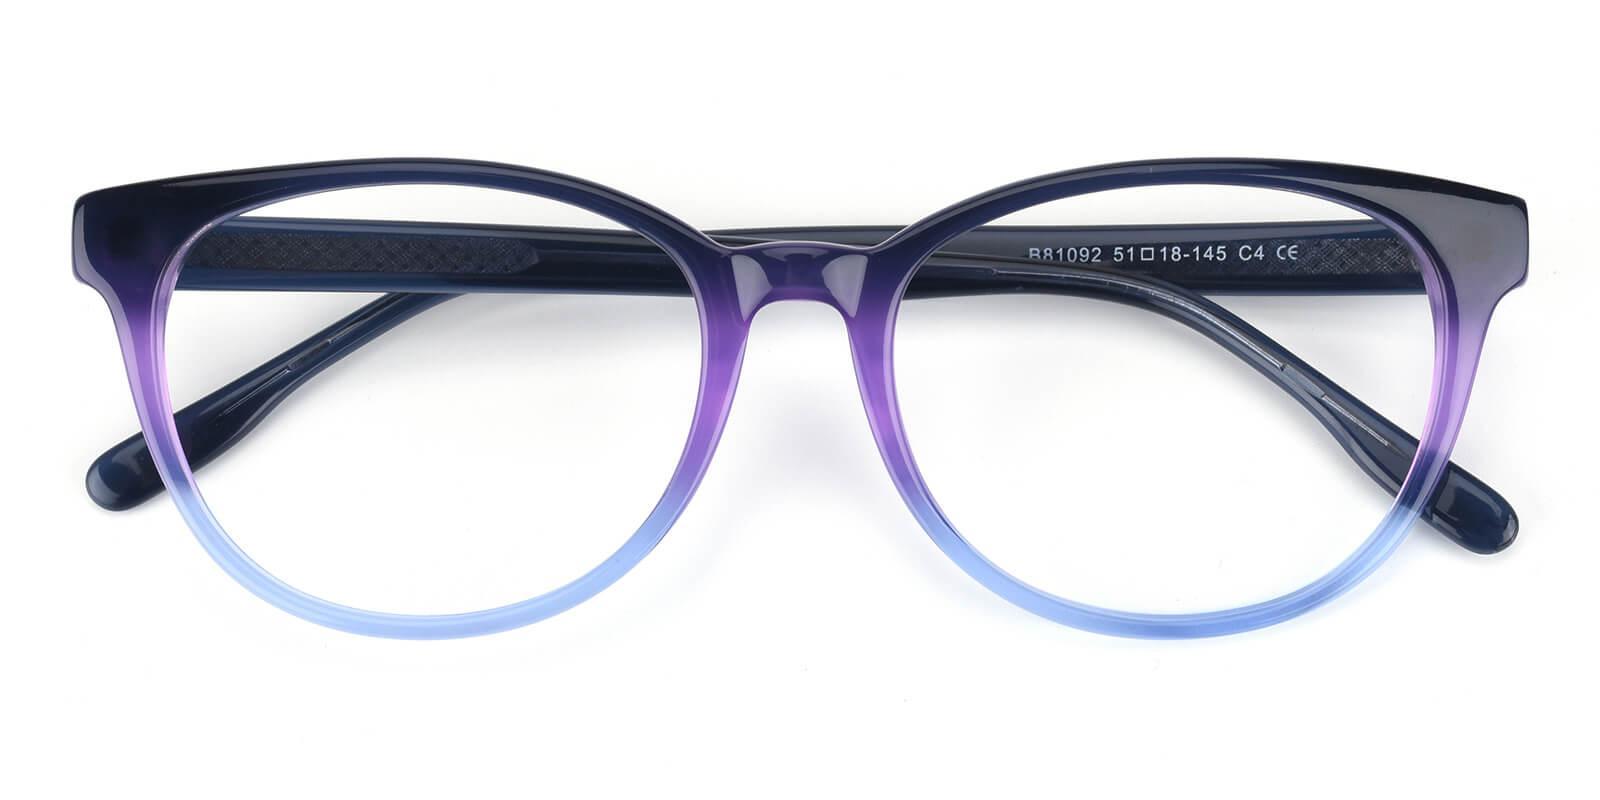 Zona-Blue-Cat-Acetate-Eyeglasses-detail